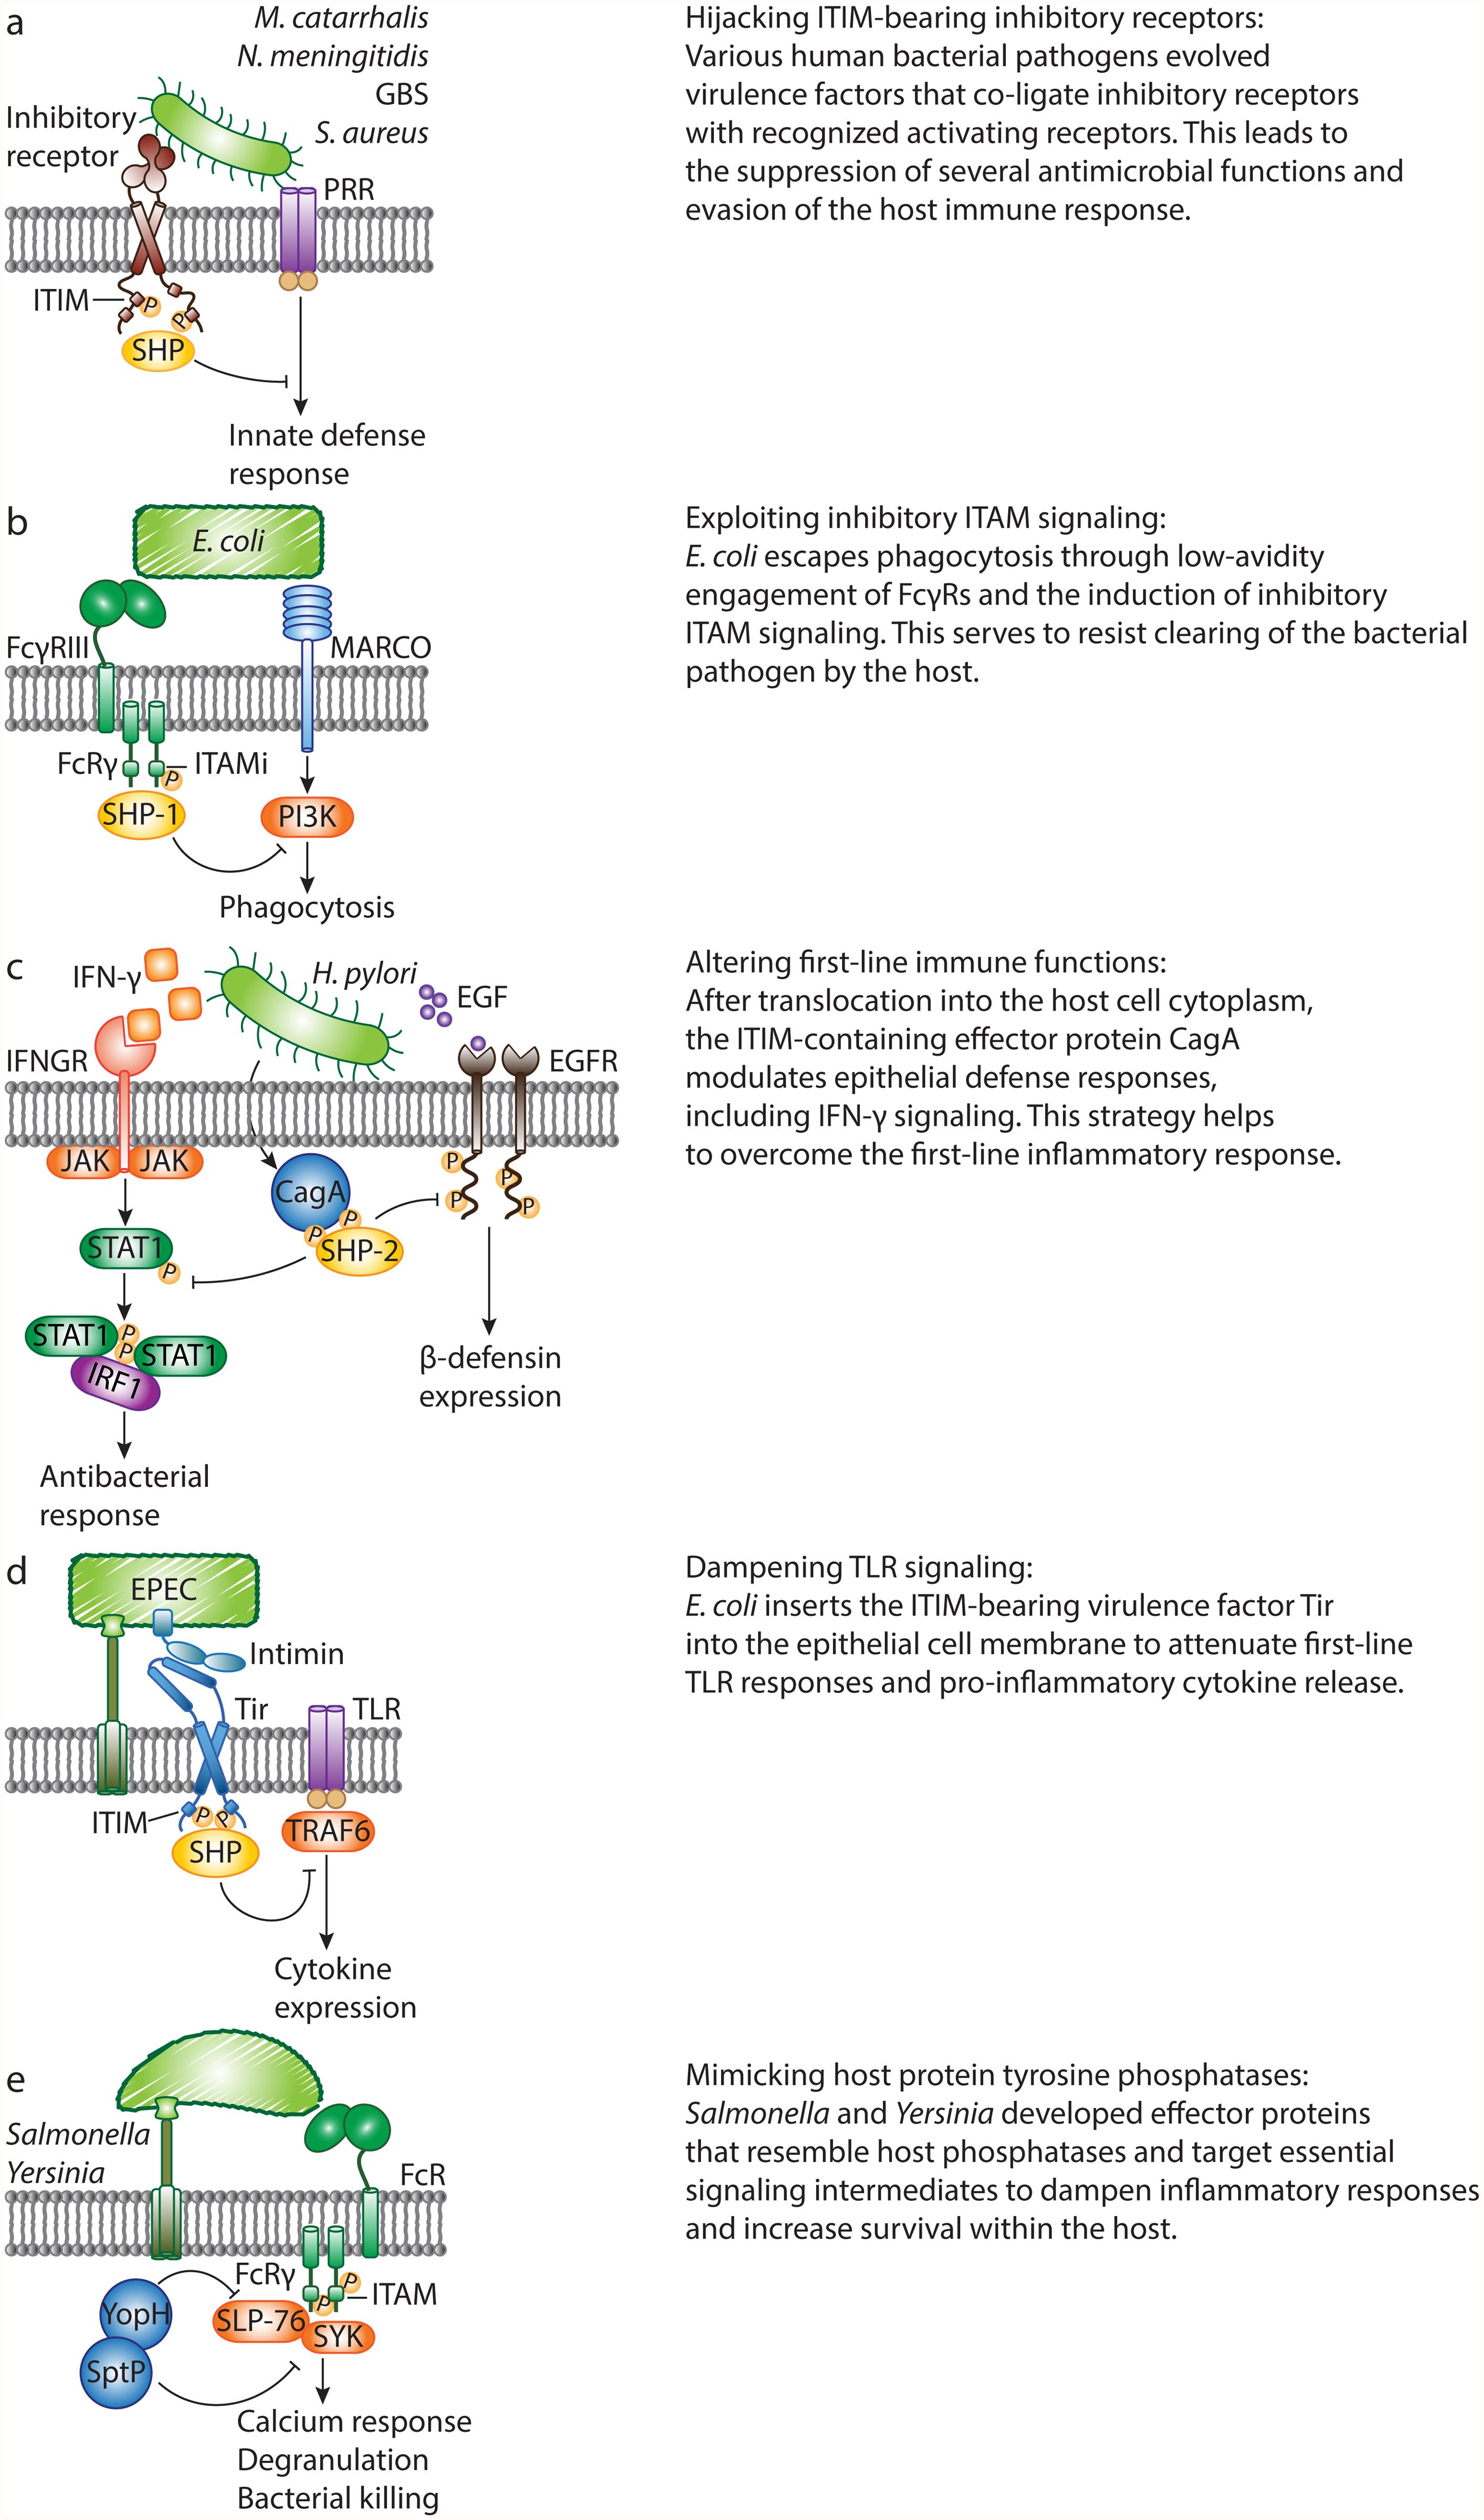 Bacterial pathogens evade host defense responses by manipulating inhibitory signaling.